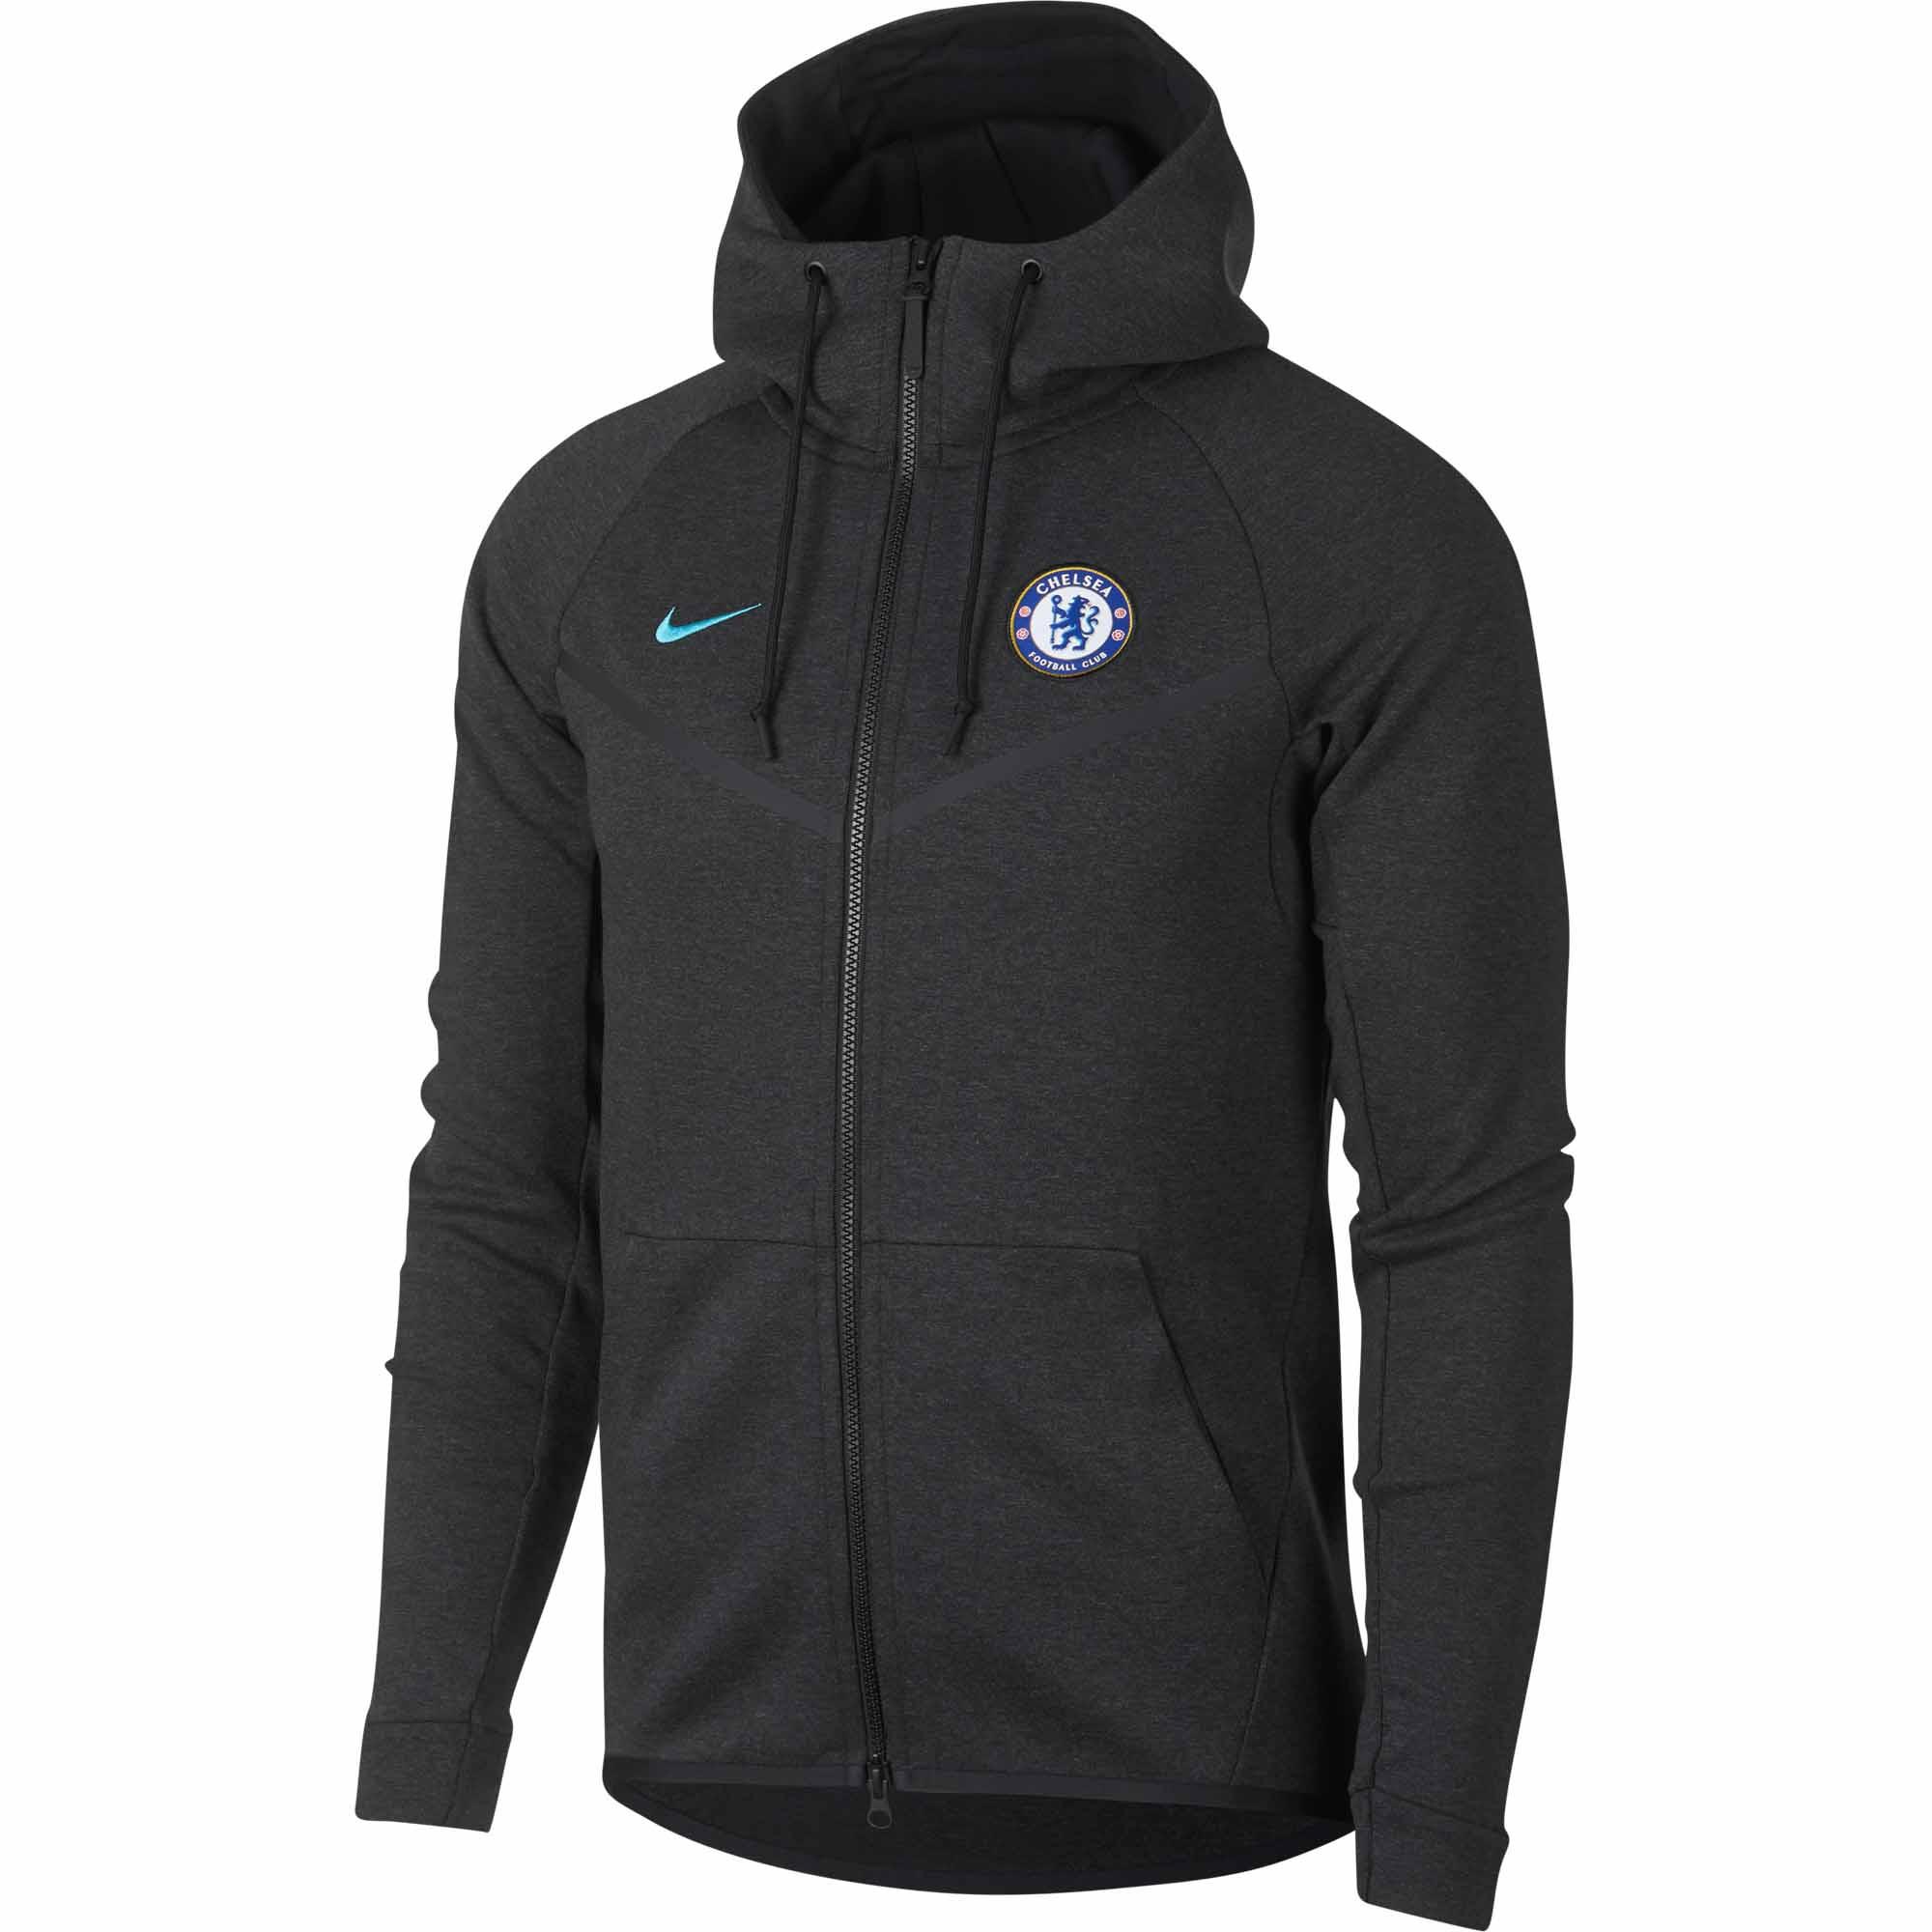 11904c854 Nike Chelsea Tech Fleece Windrunner Jacket – Black Heather/Omega Blue